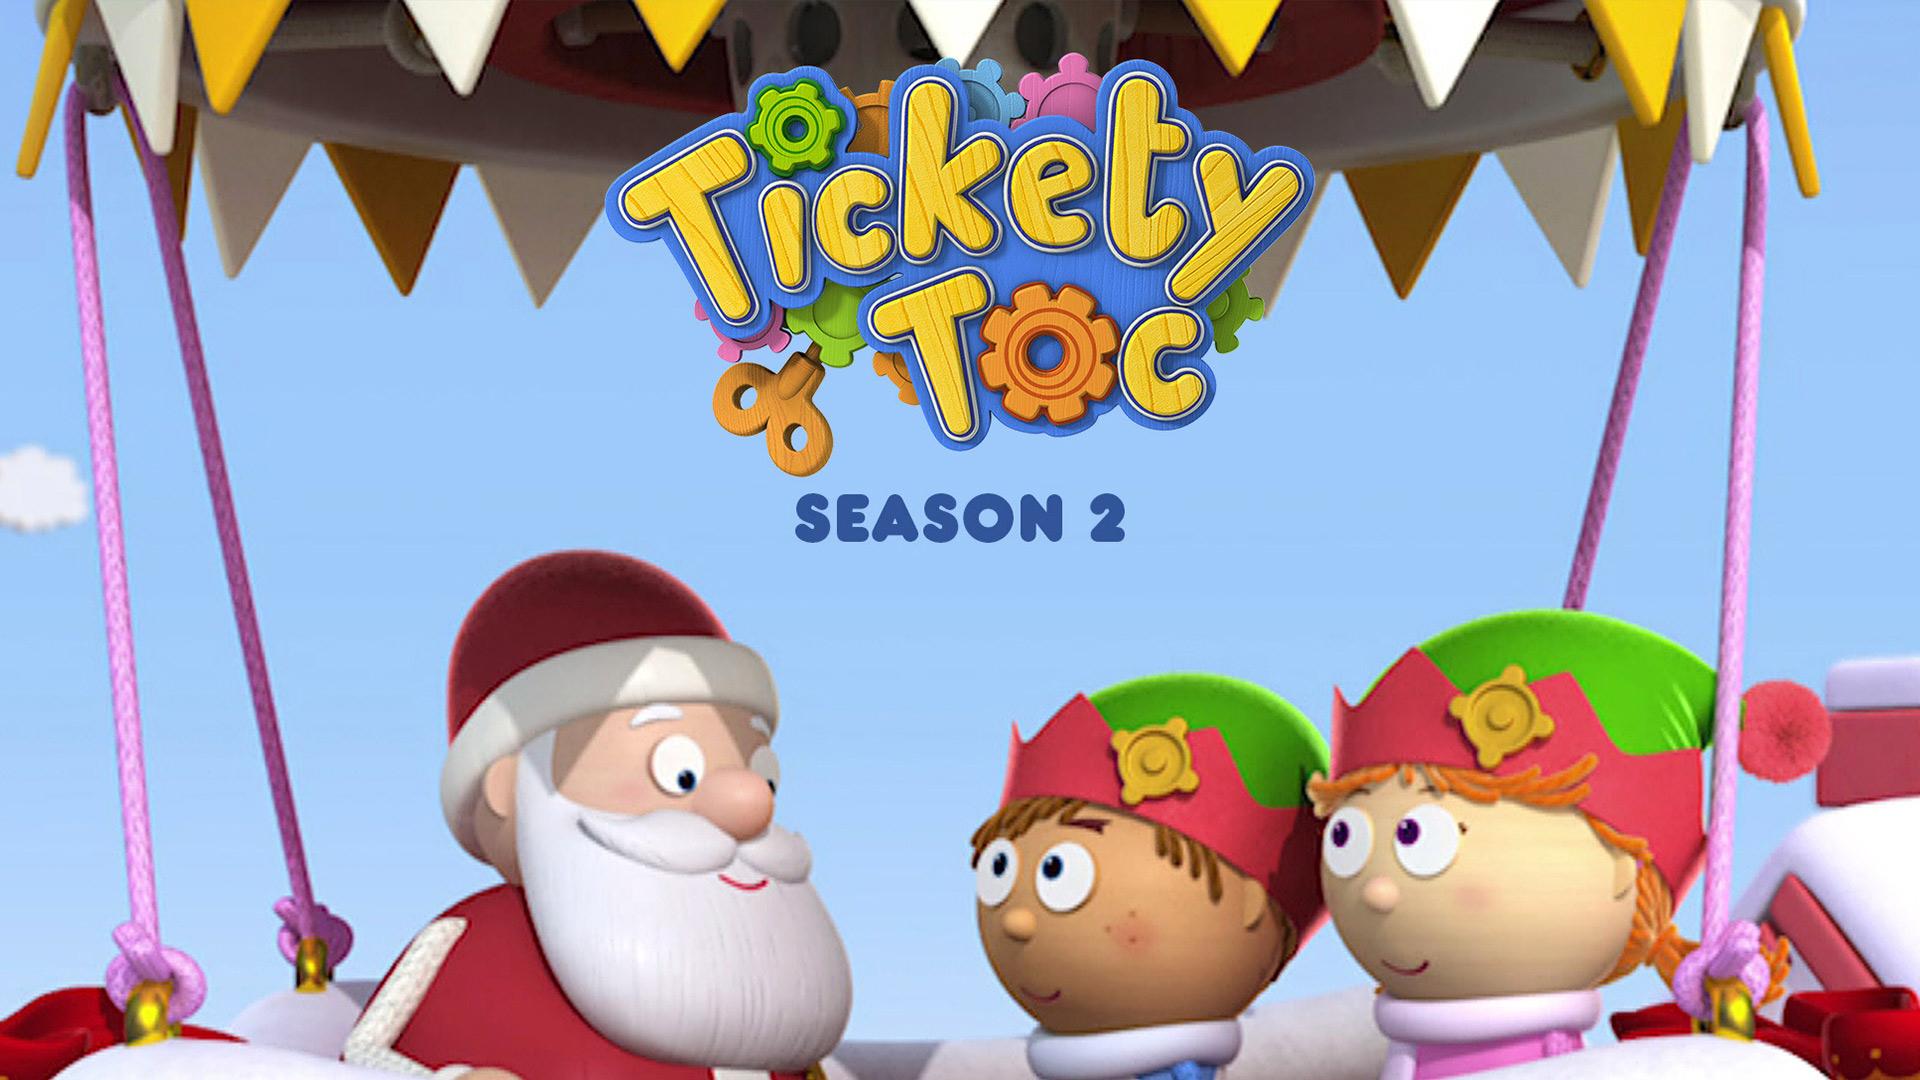 Tickety Toc Season 2